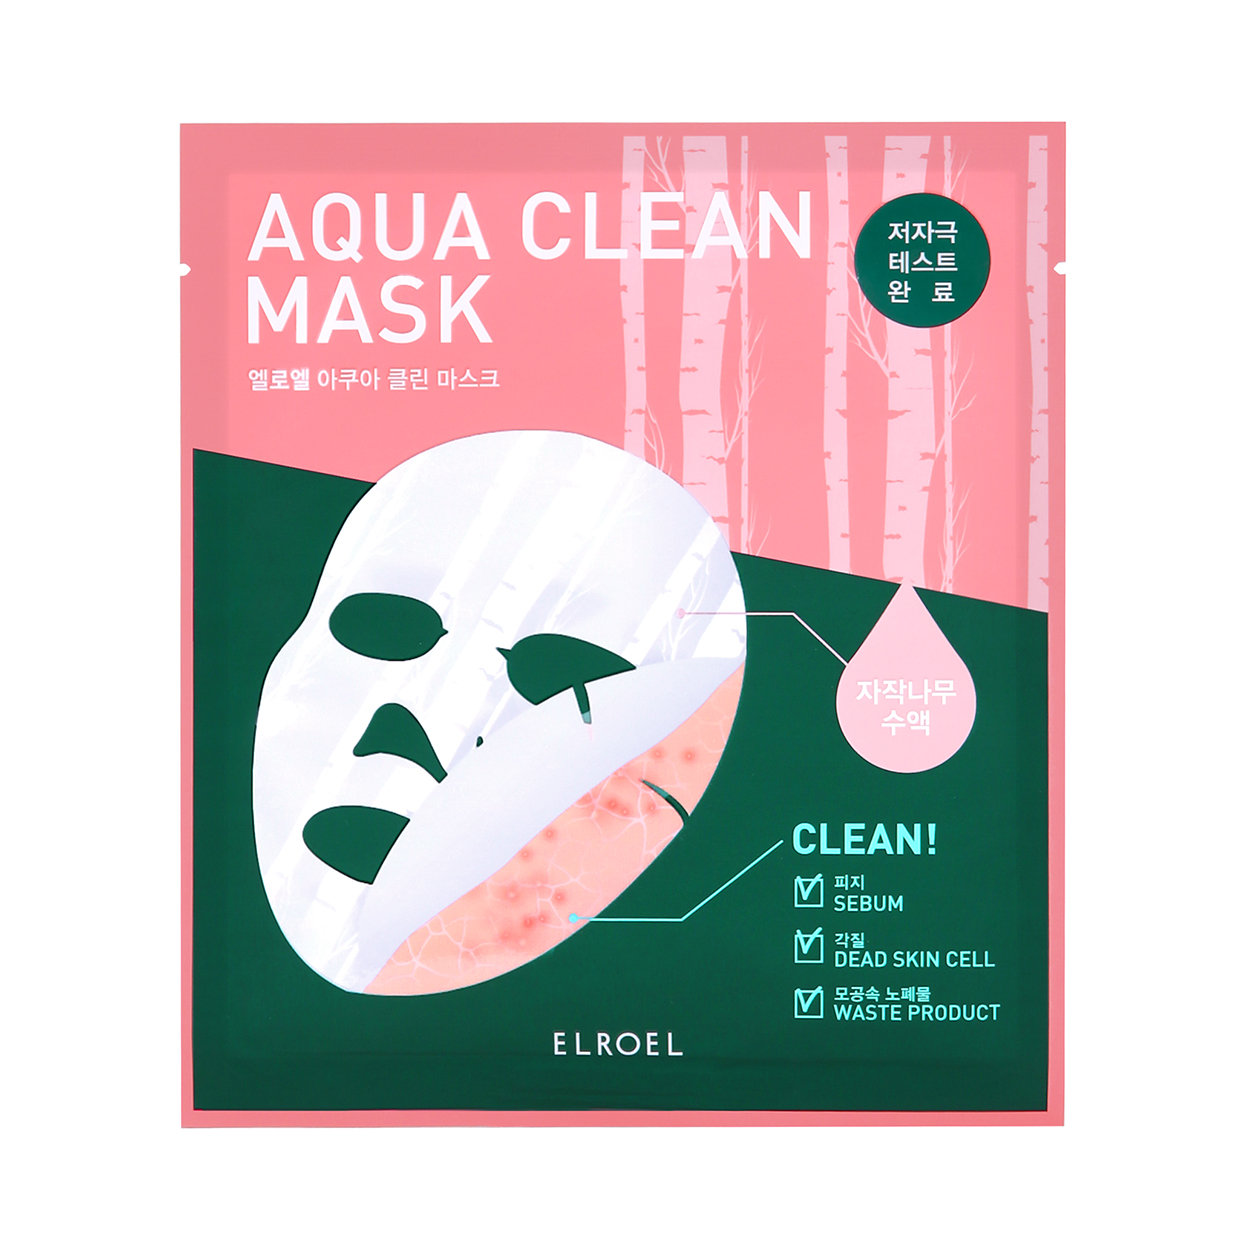 Image of 5 Maschere Monouso Aqua Clean